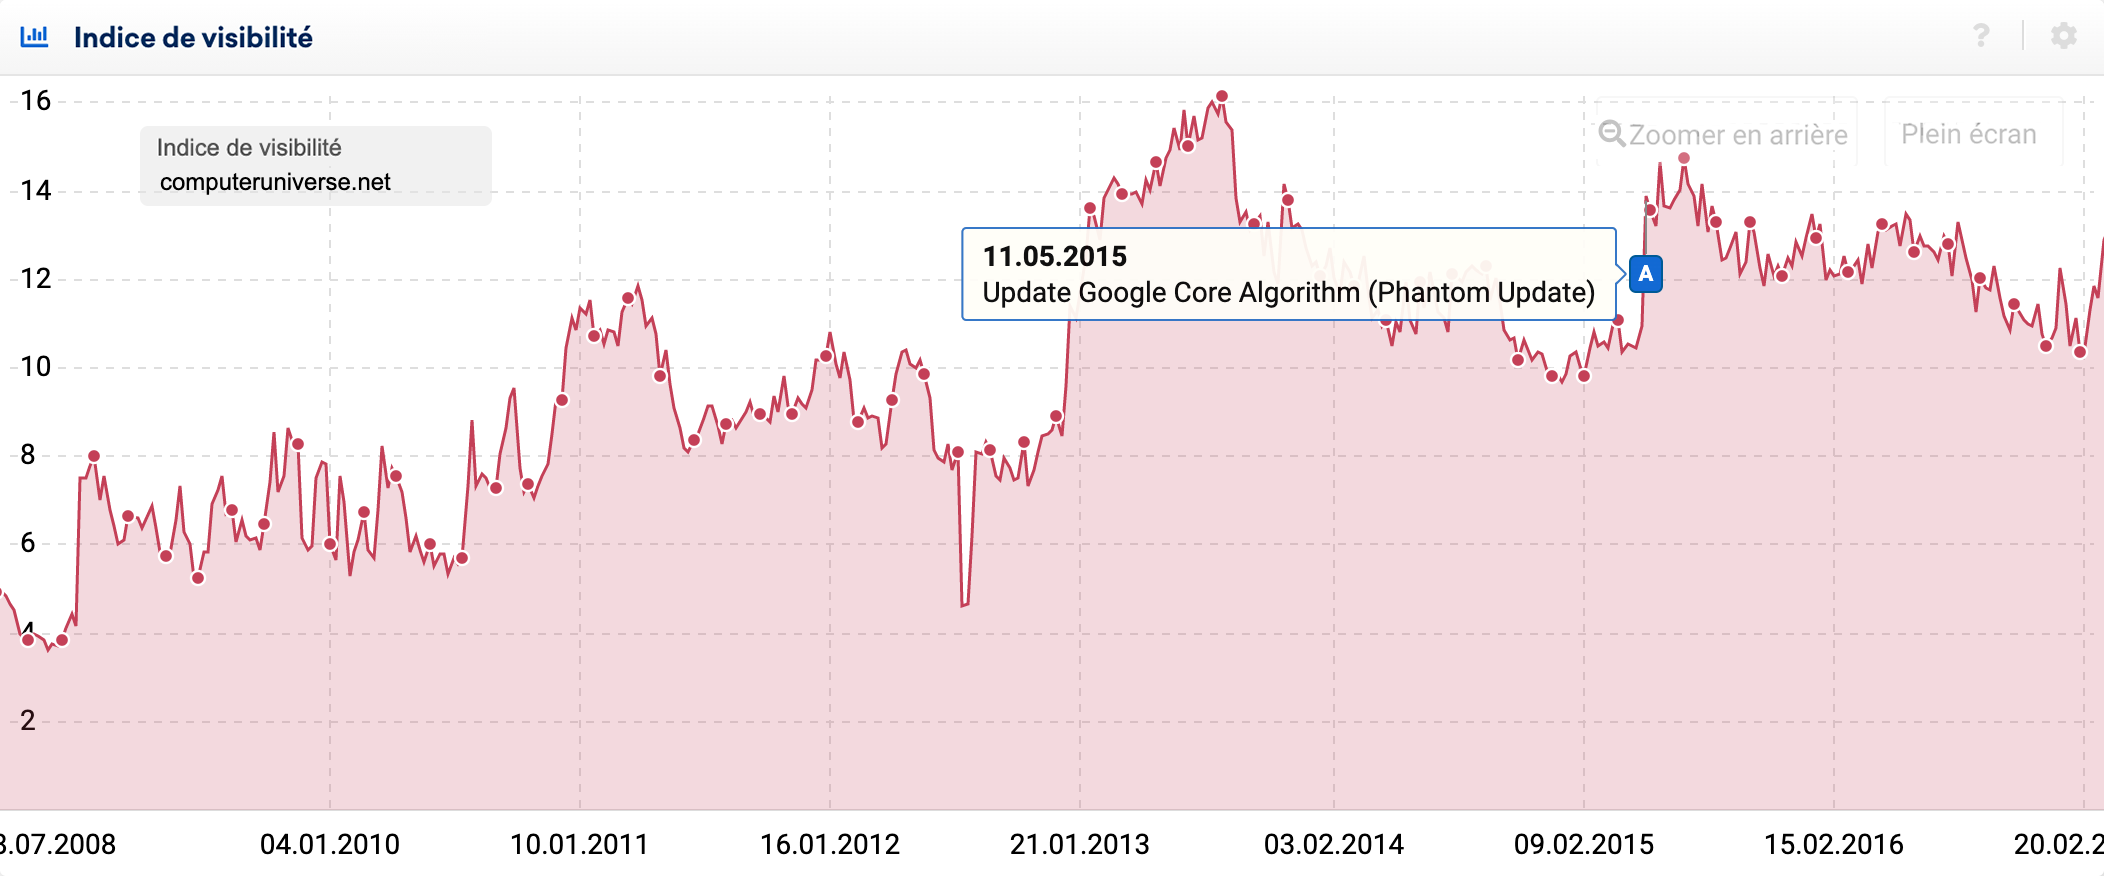 On the upside of Google's Phantom Update: computeruniverse.net